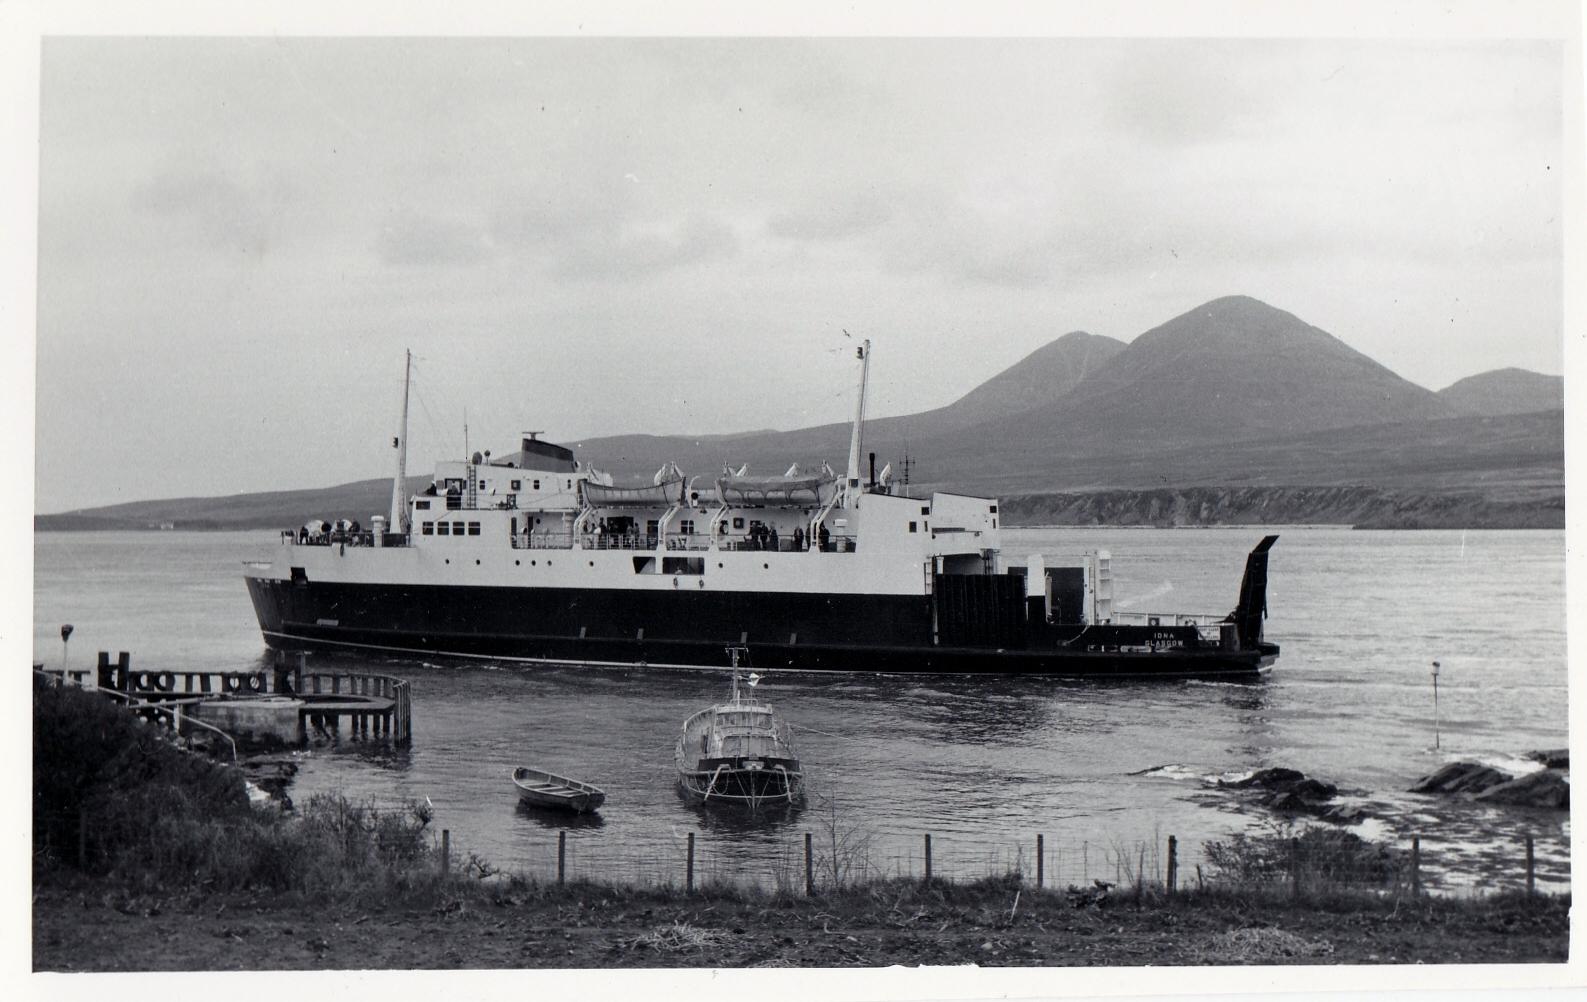 Iona arriving at Port Askaig (Jim Aikman Smith)